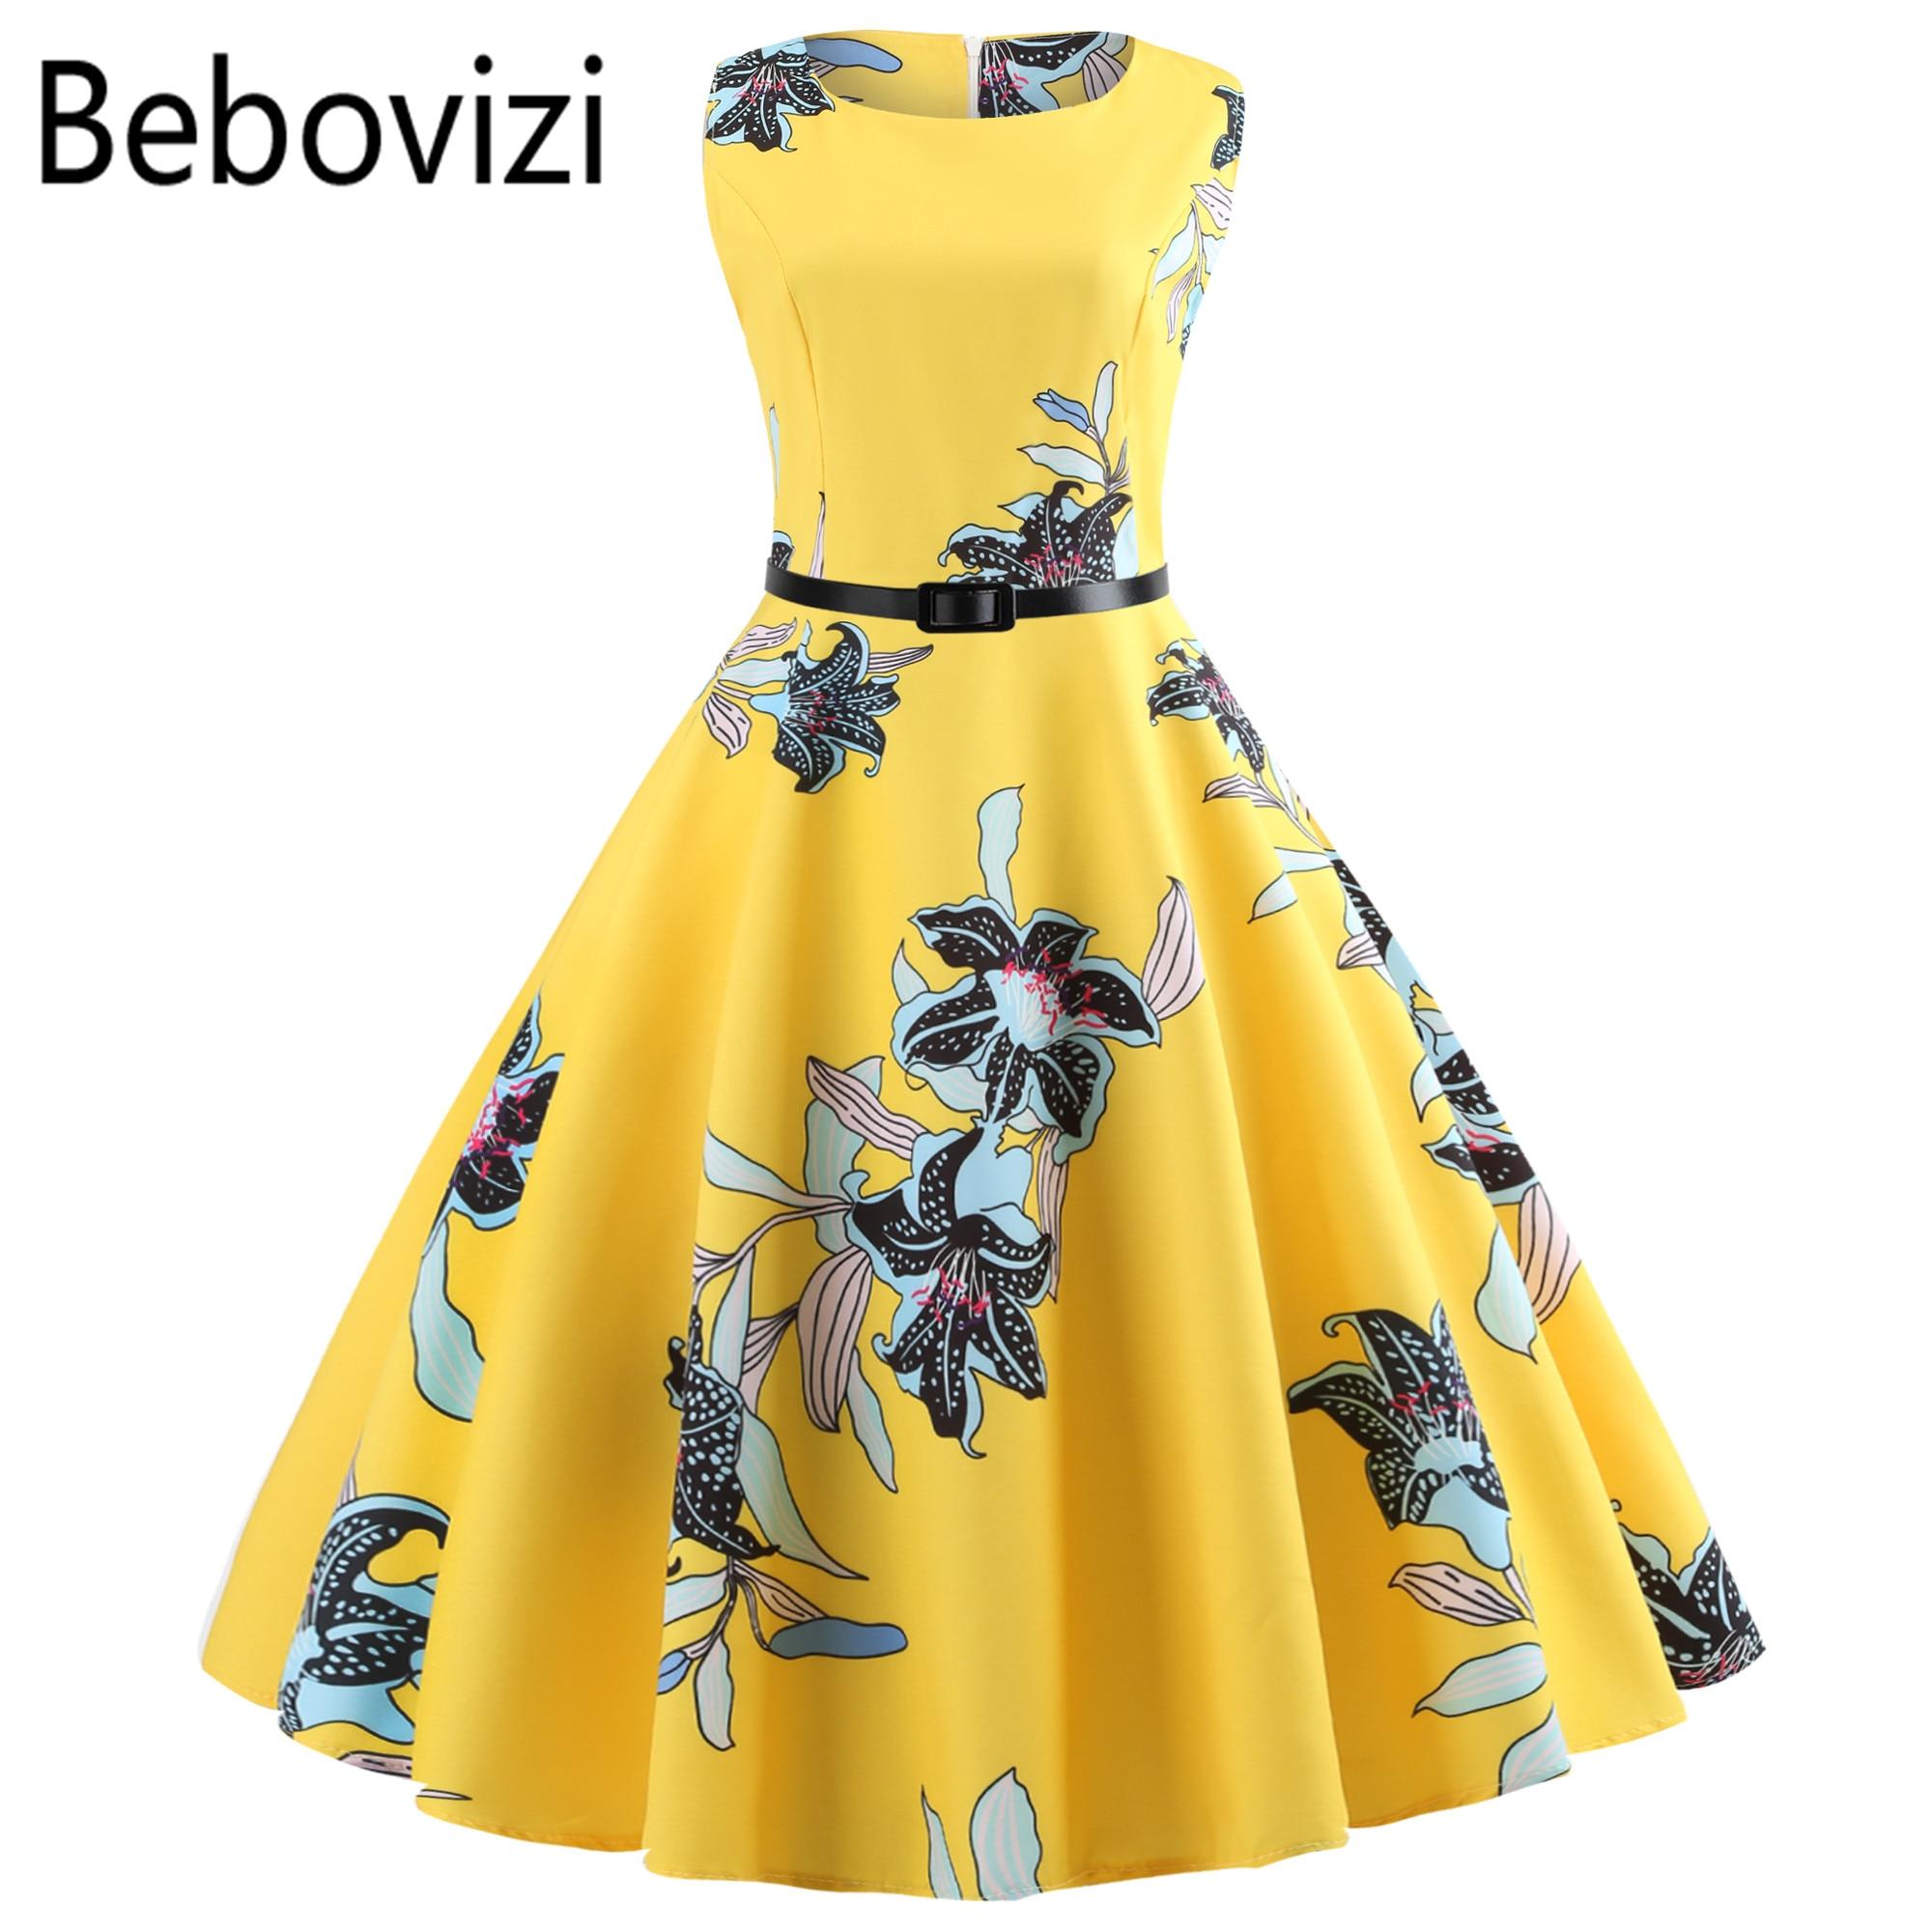 e781929952 Rainbow Plaid Plus Size Women Vintage Dress Robe Vestidos Hepburn 50s Party  Dresses Casual Elegant Rockabilly Pin Up Sundress